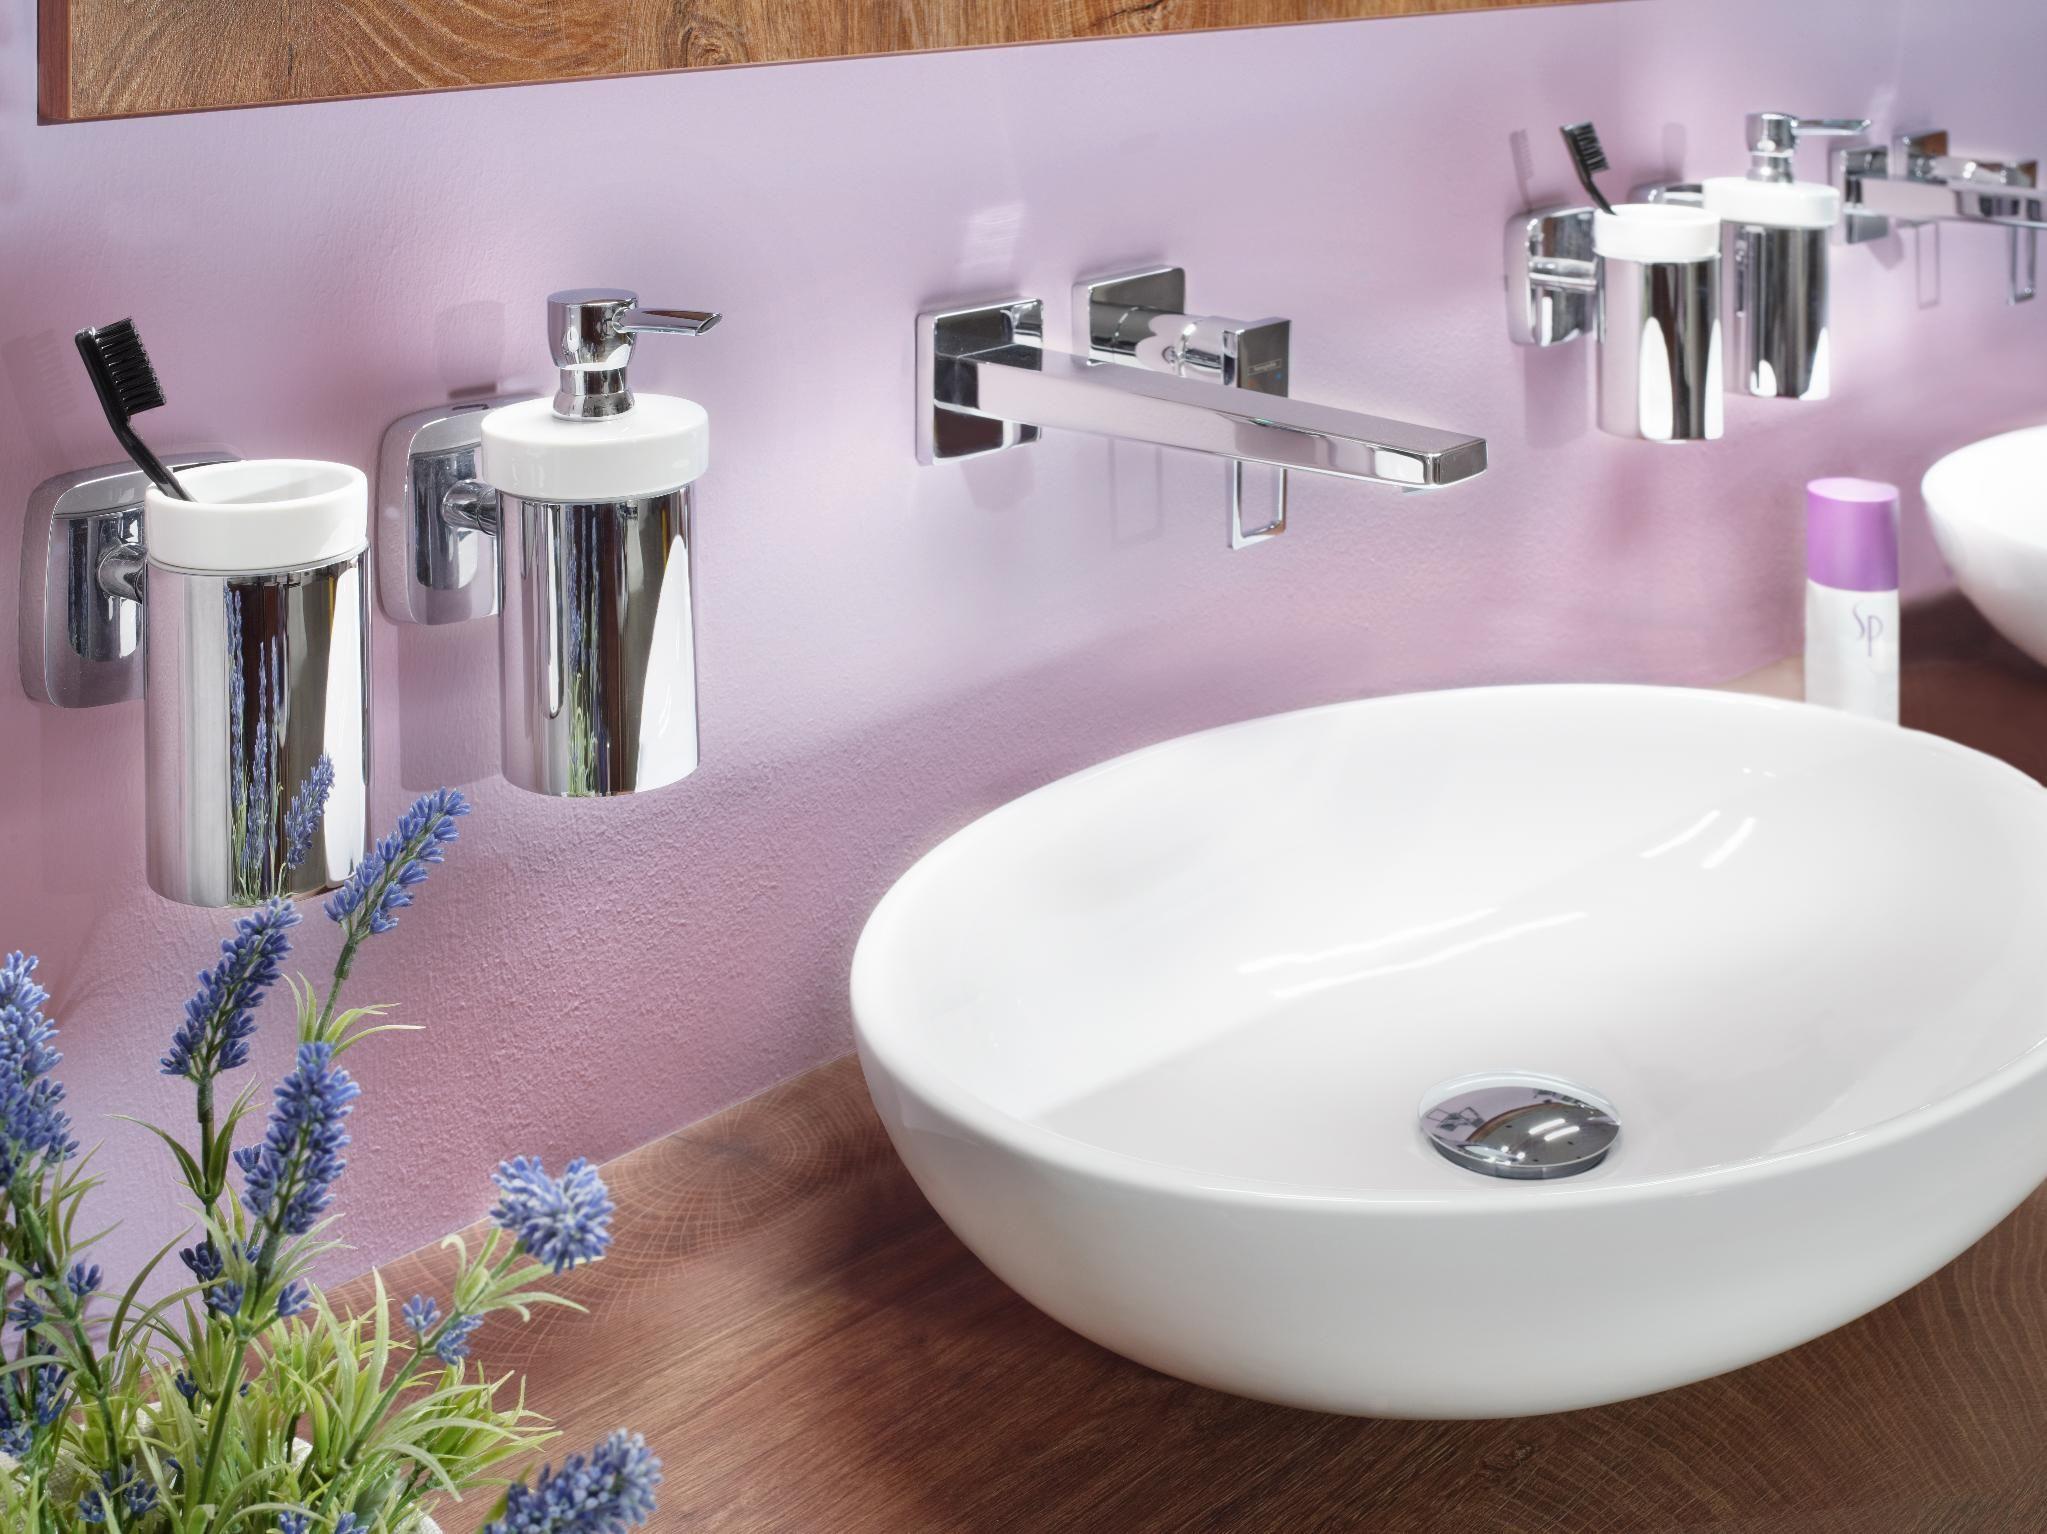 Bathroom Decor Organization Hansgrohe Bathroom Accessories Bathroom Design Decor Glass Bathroom